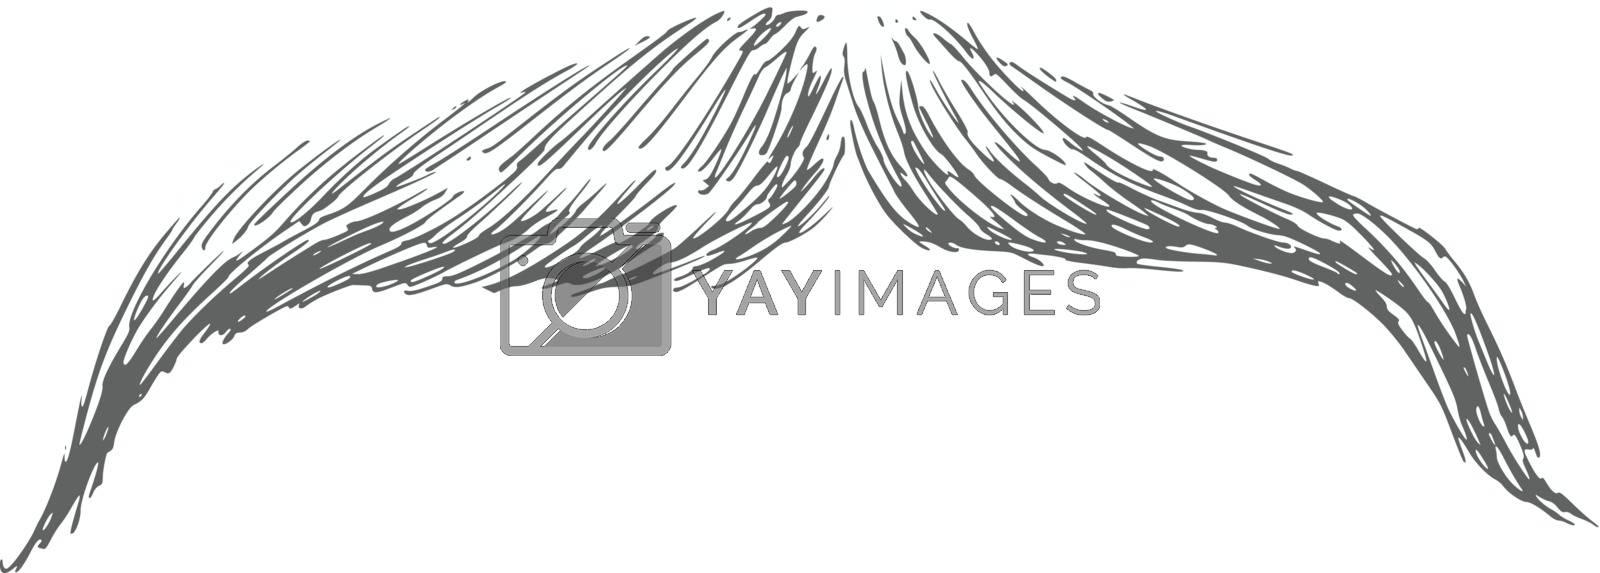 hand drawn, sketch, cartoon illustration of moustache